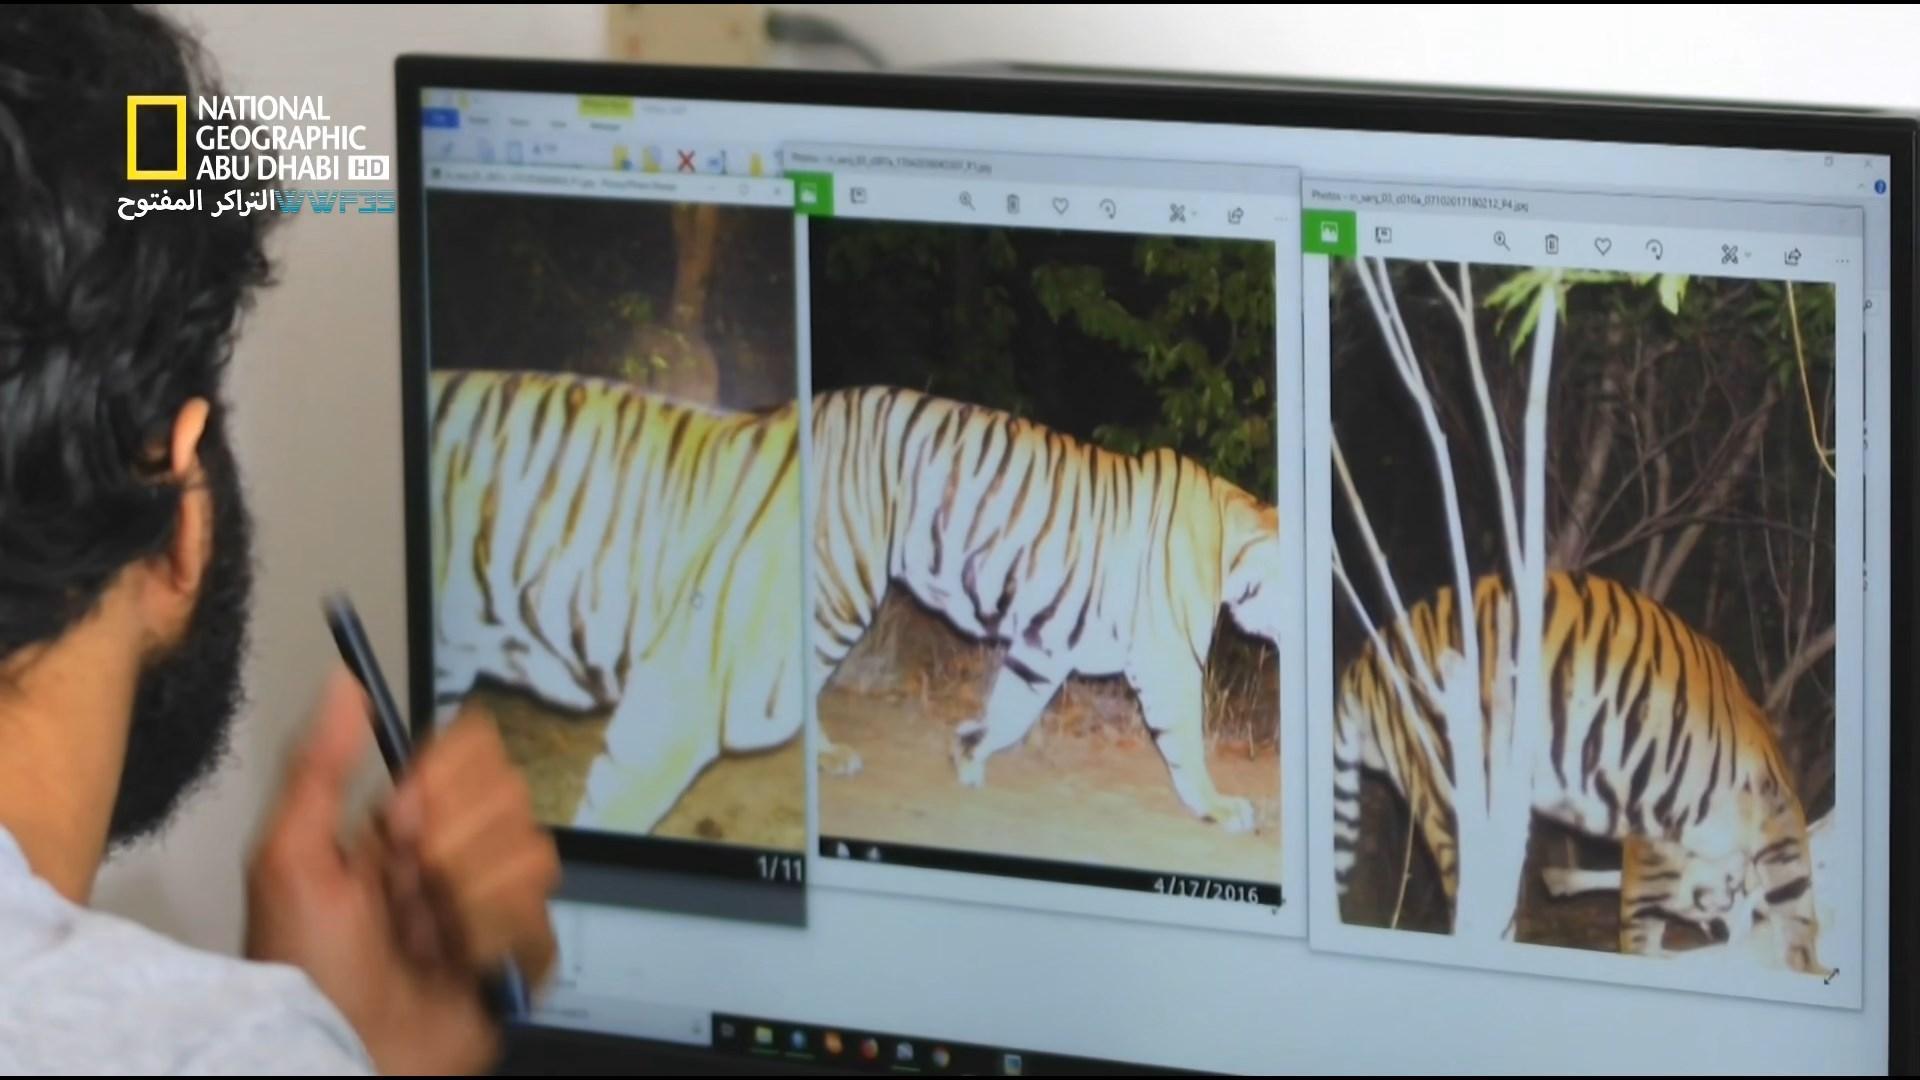 انقراض النمور counting tiger[مدبلج] [1080p] تحميل تورنت 6 arabp2p.com